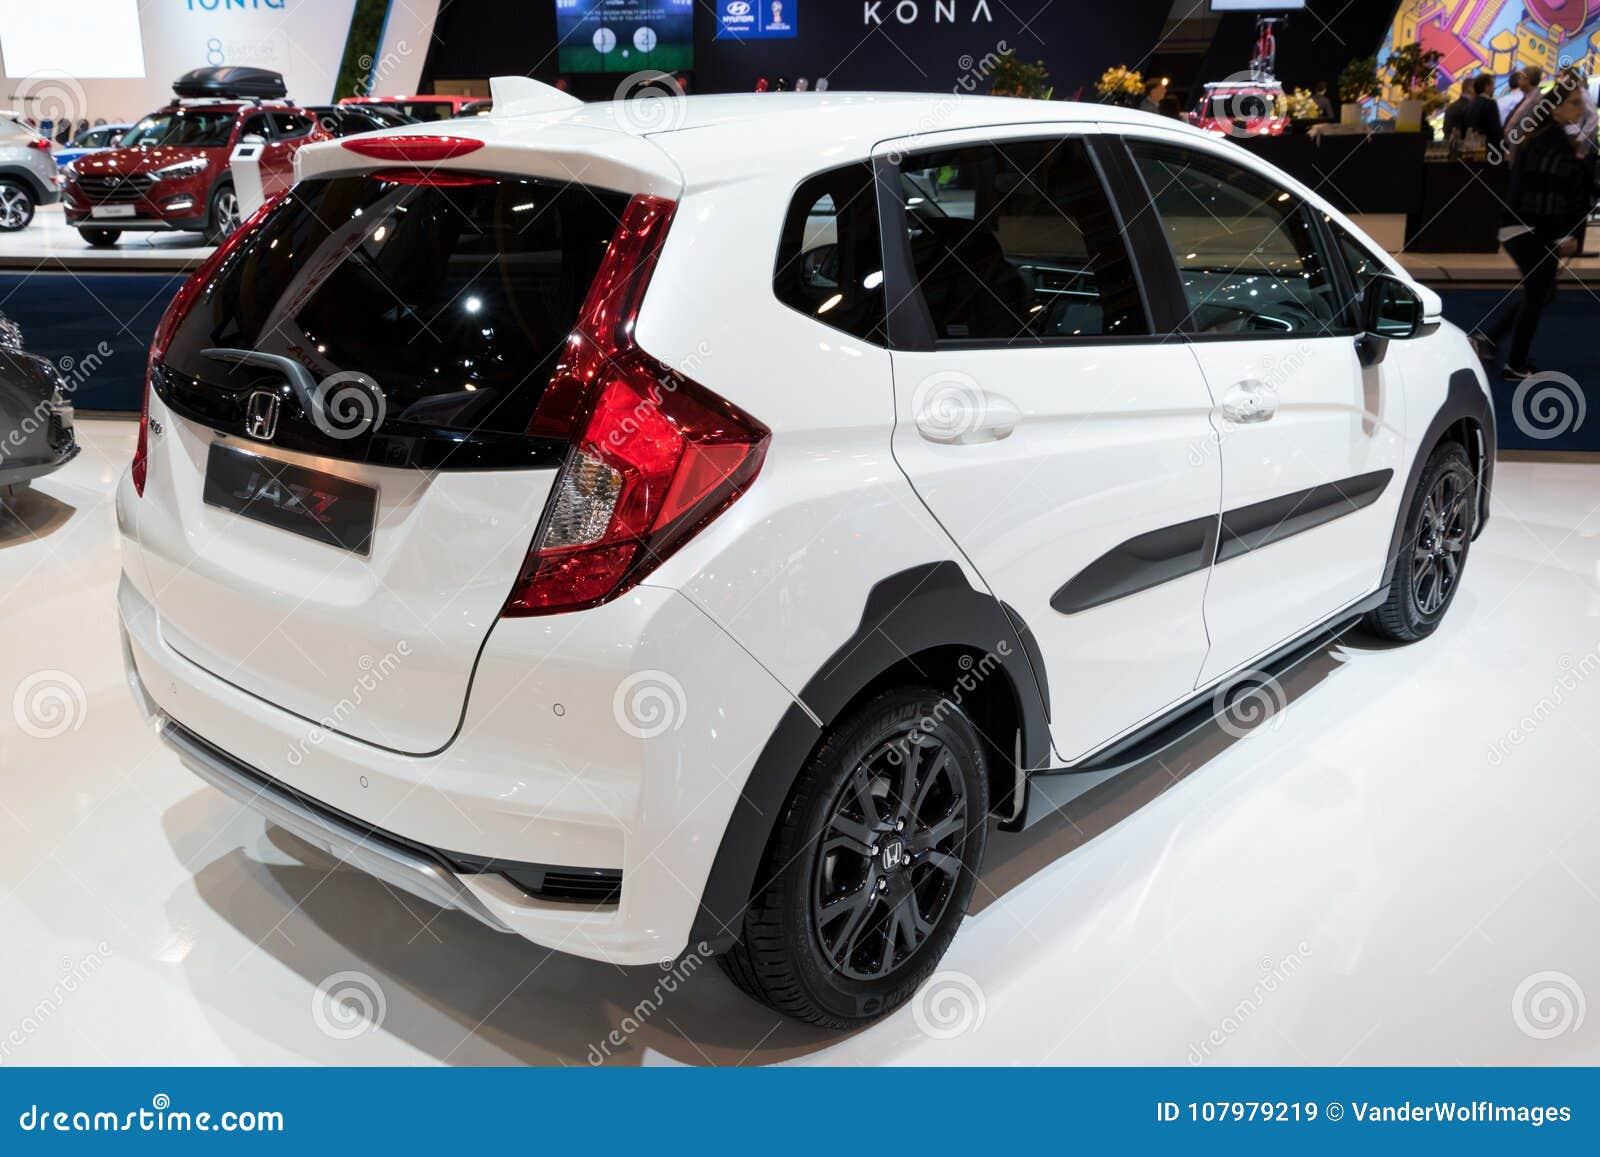 Honda Jazz Car Editorial Stock Image Image Of Economic 107979219